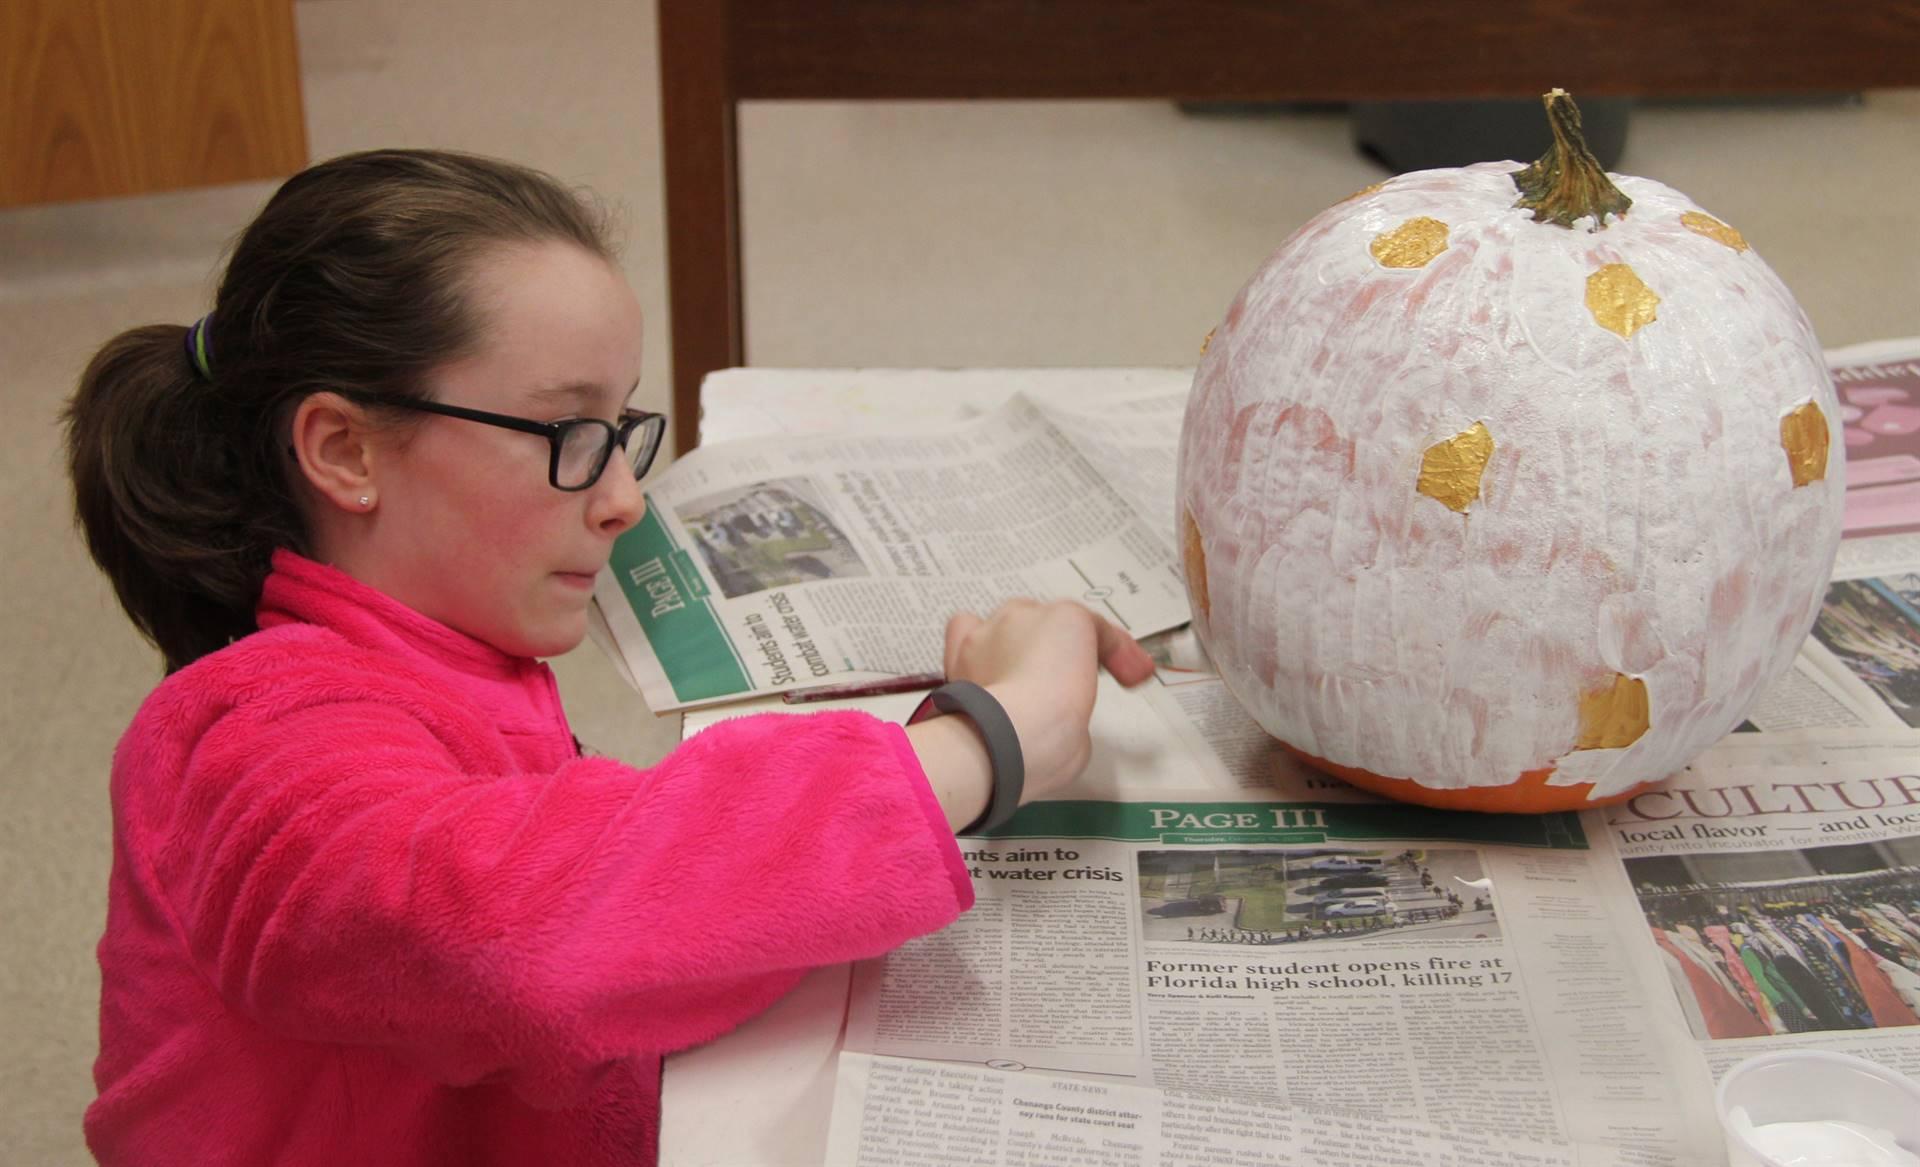 student painting pumpkin